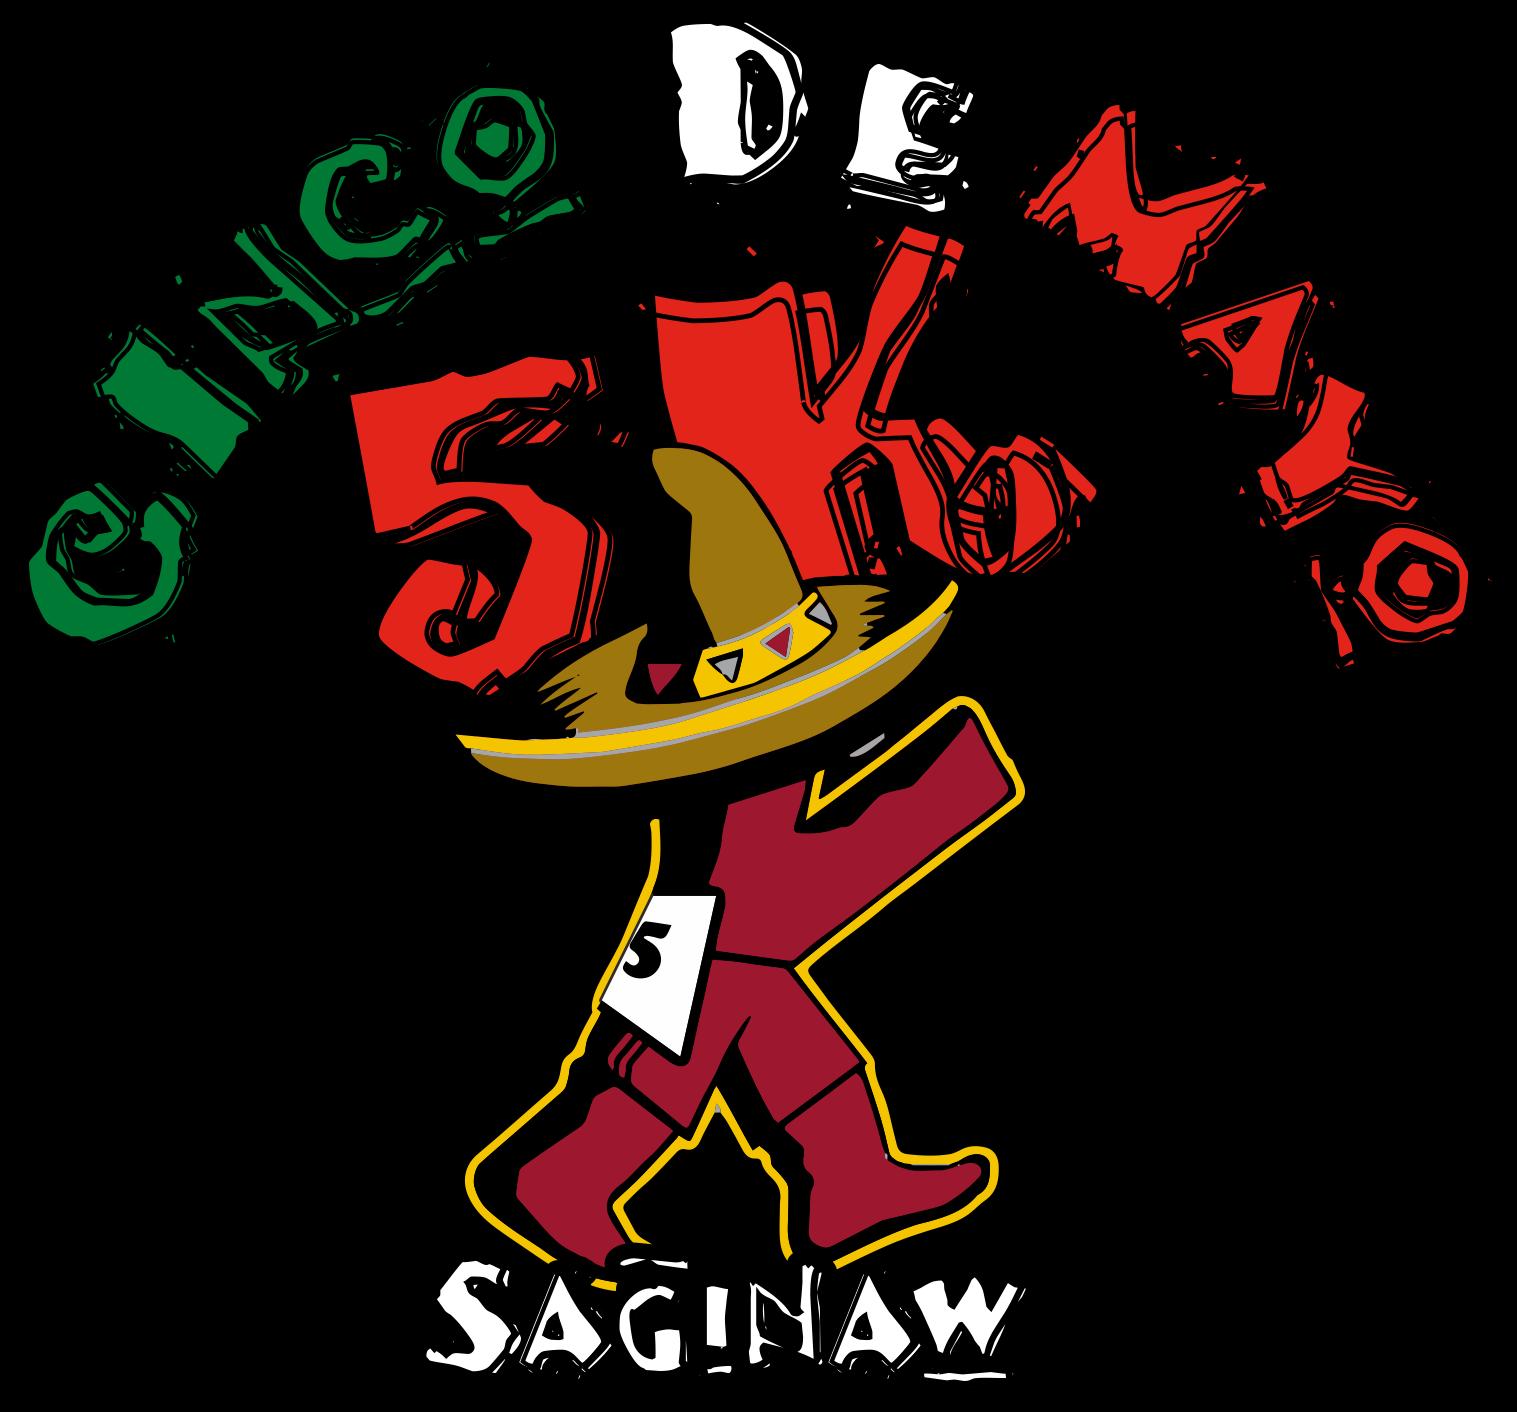 May 5 - Saginaw, MI